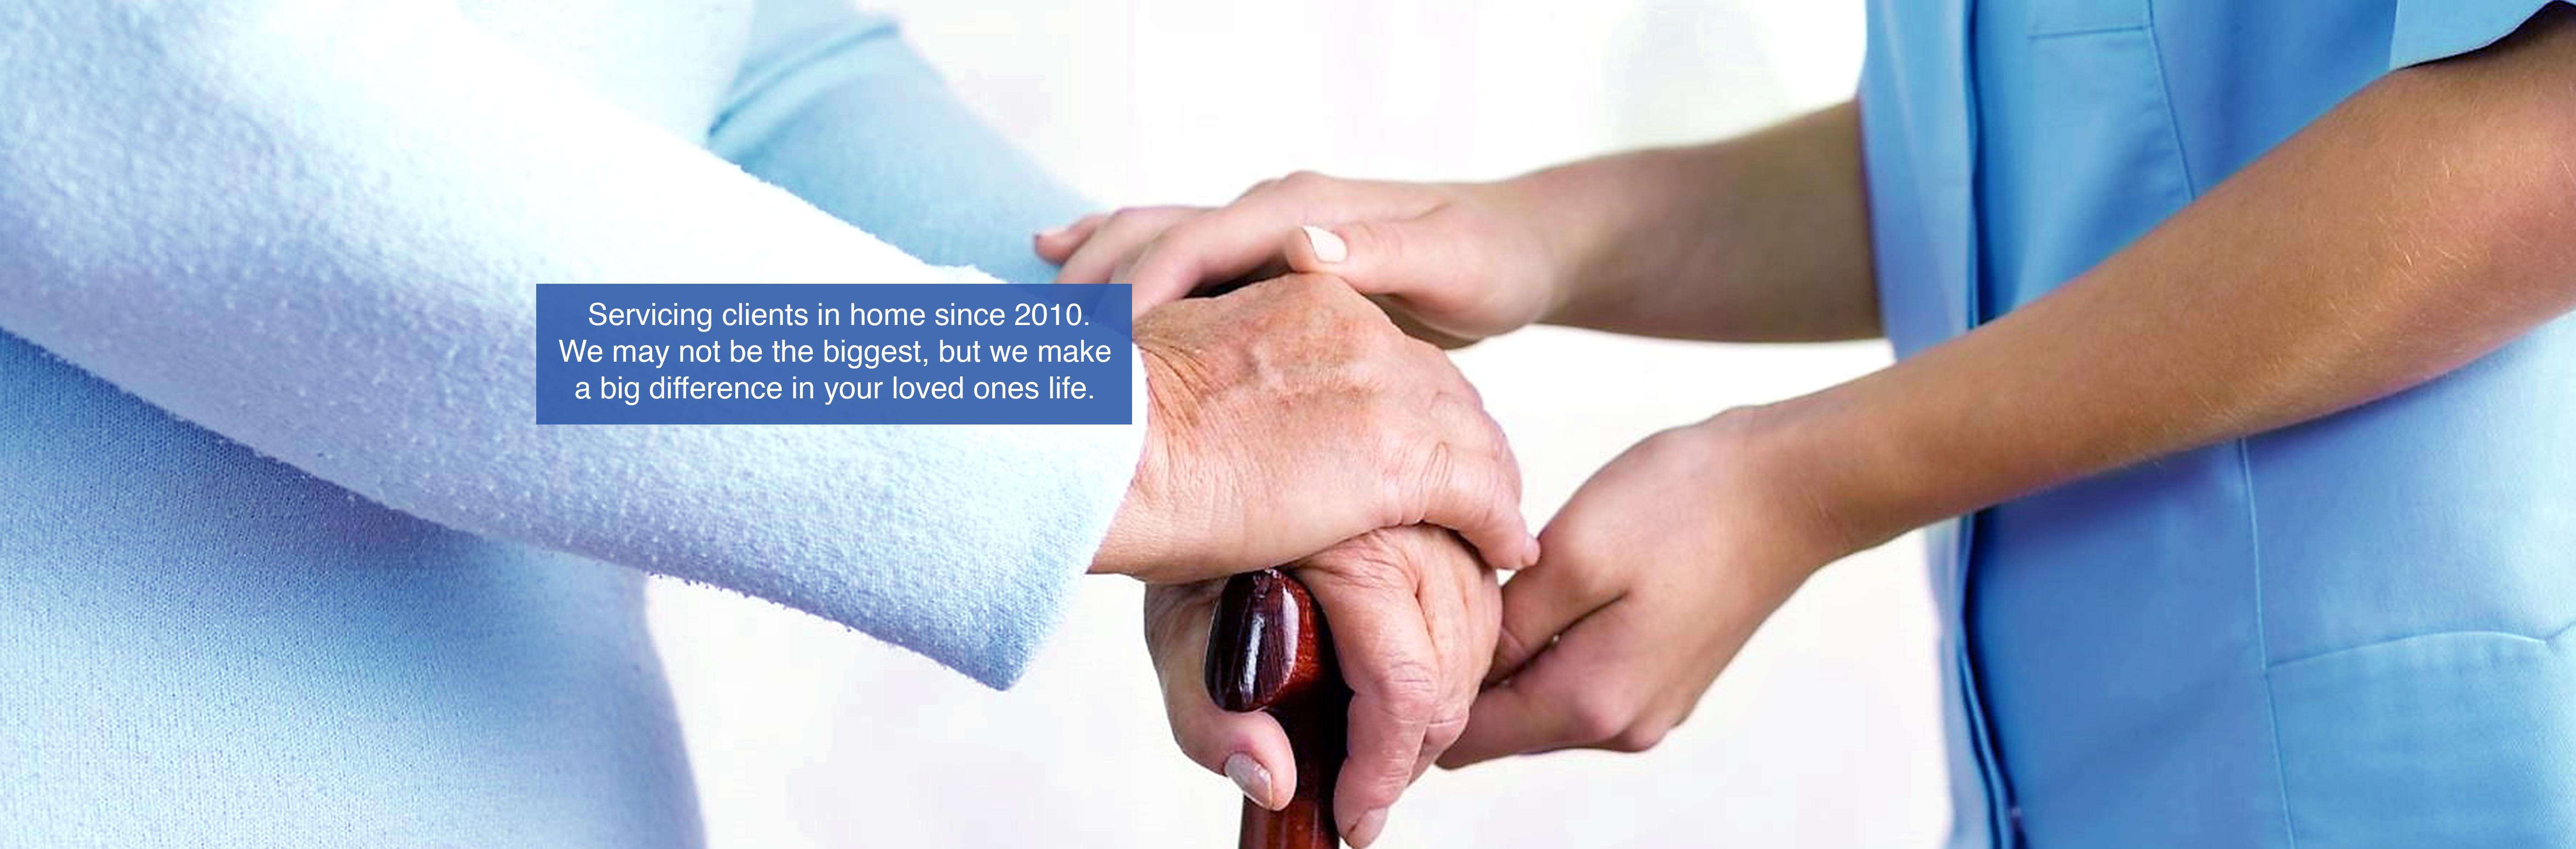 ServicingClients_Slide_Homepage